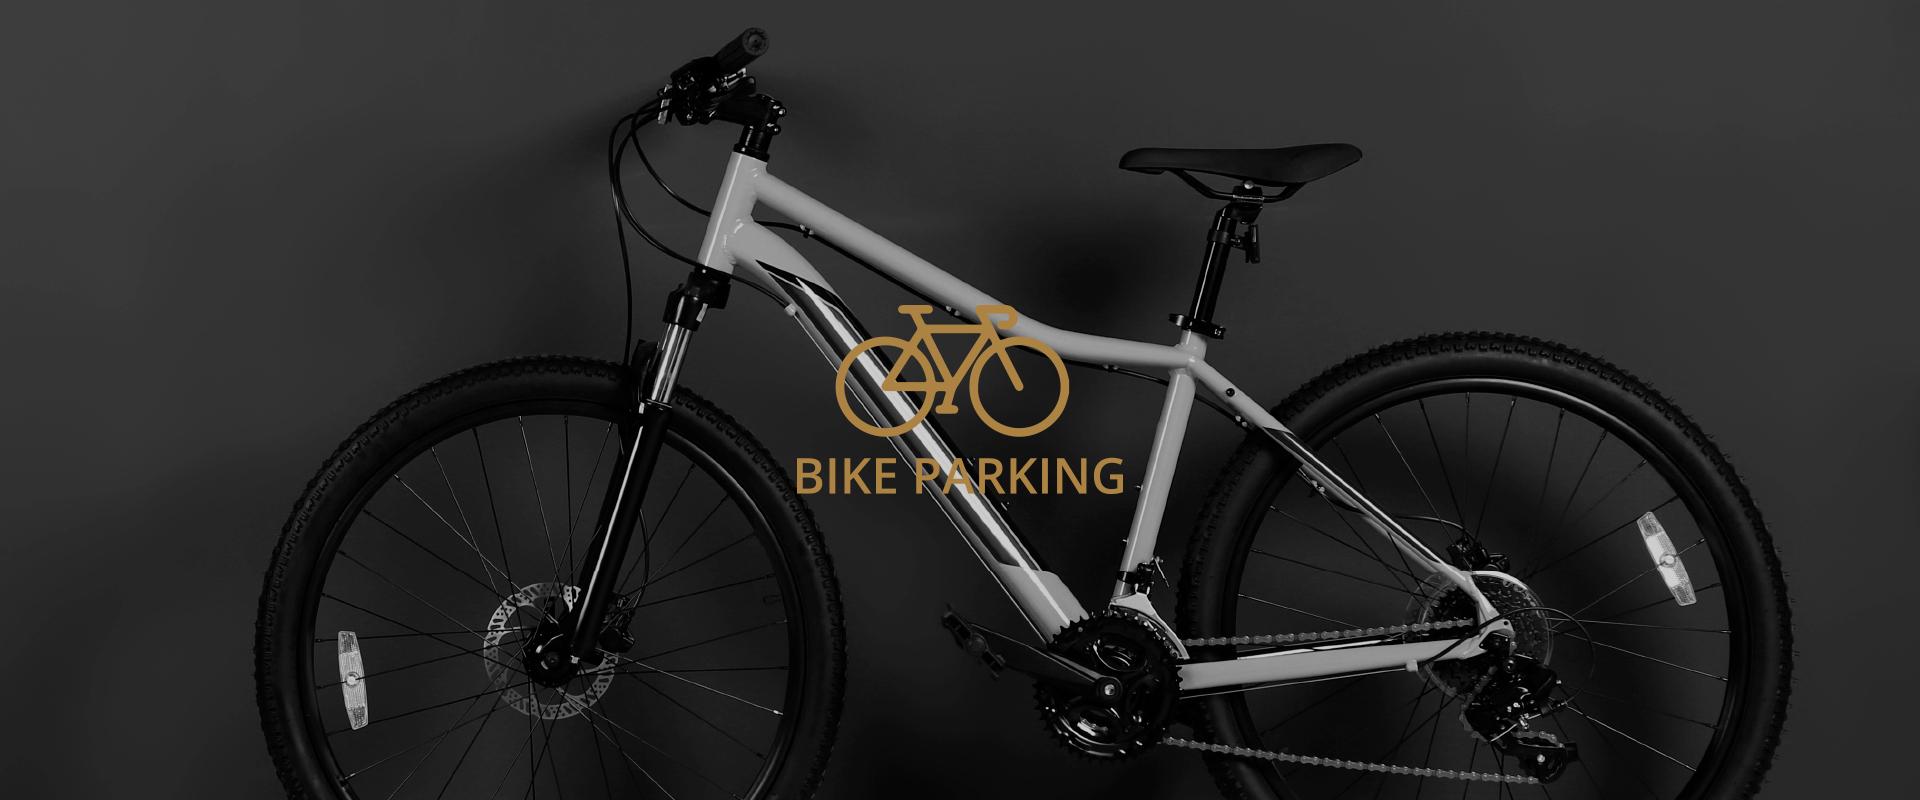 bike+icon